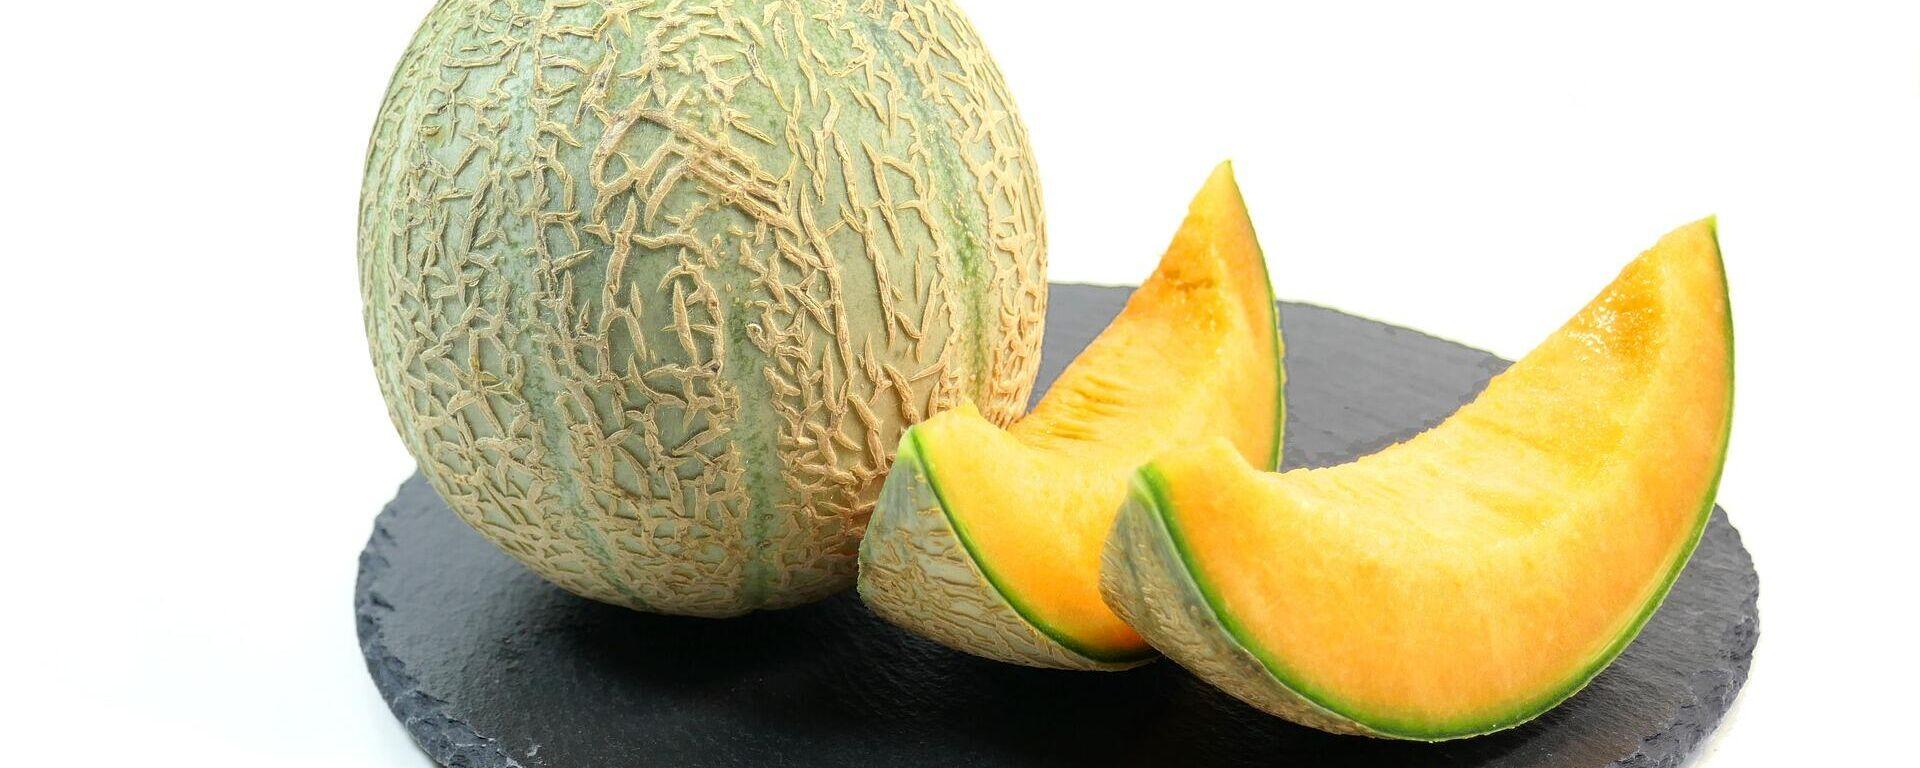 Melone (Symbolbild) - SNA, 1920, 28.08.2021